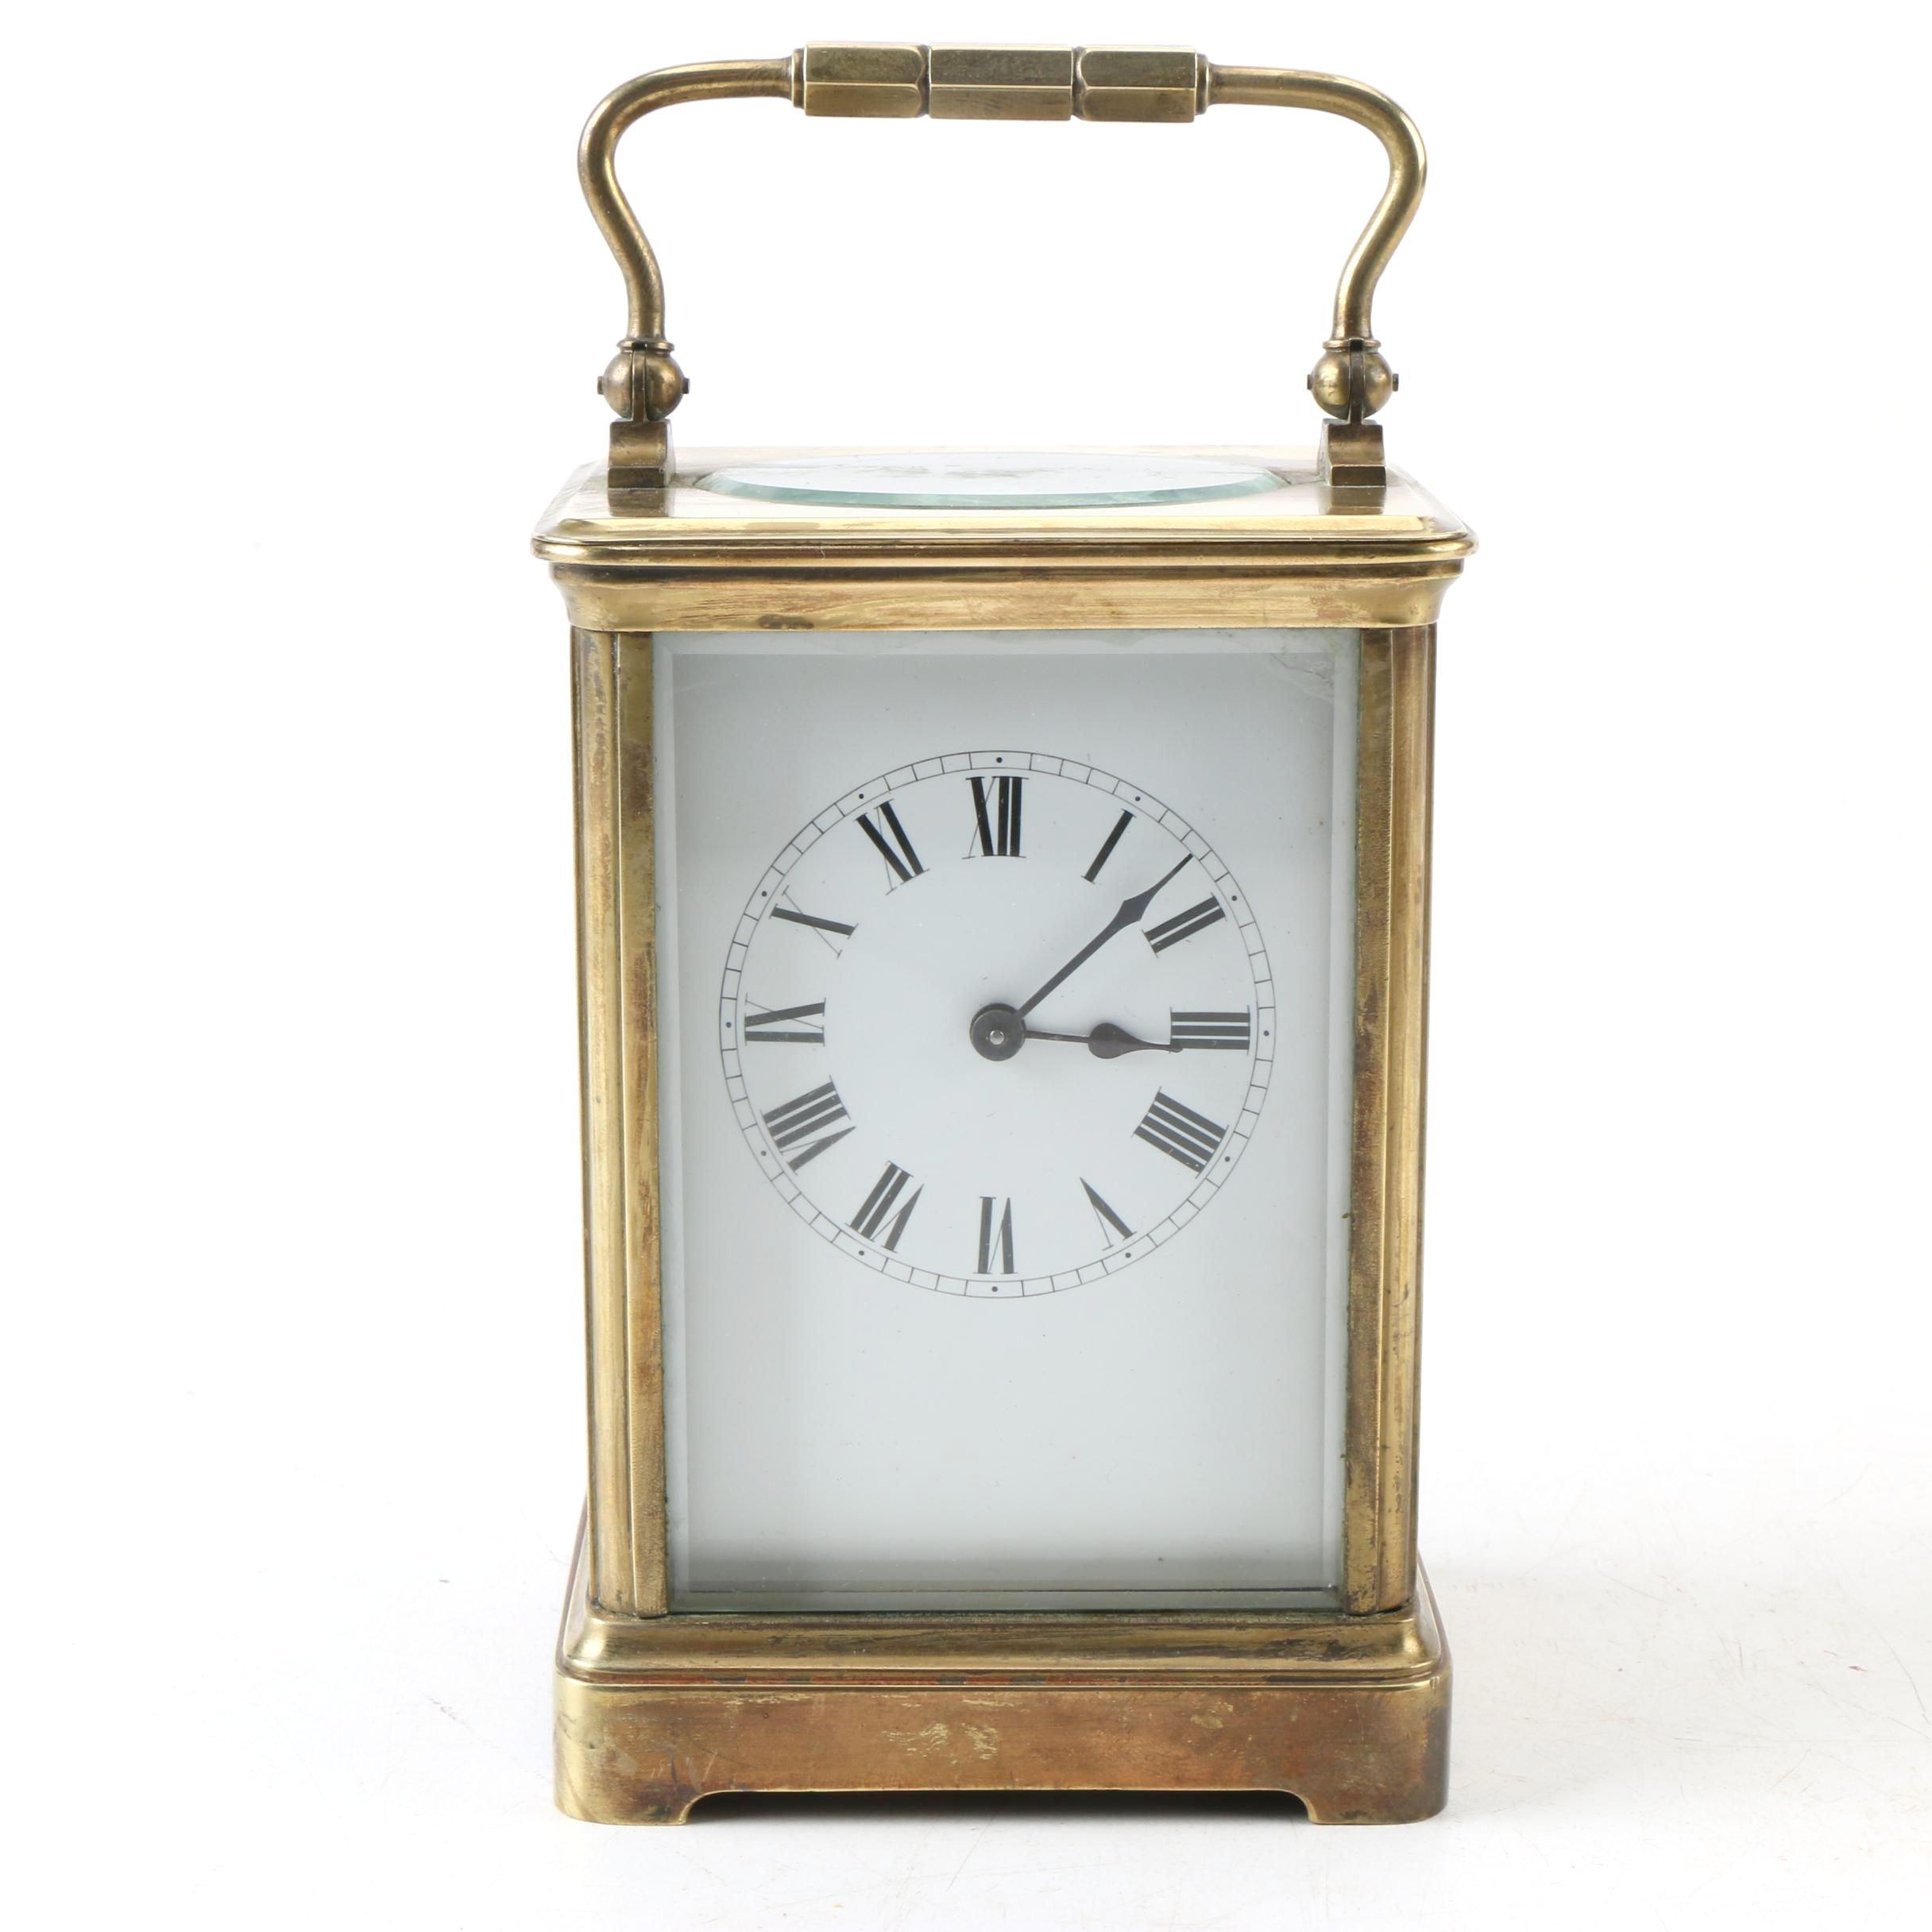 Brass Carriage Shelf Clock with Glass Panels